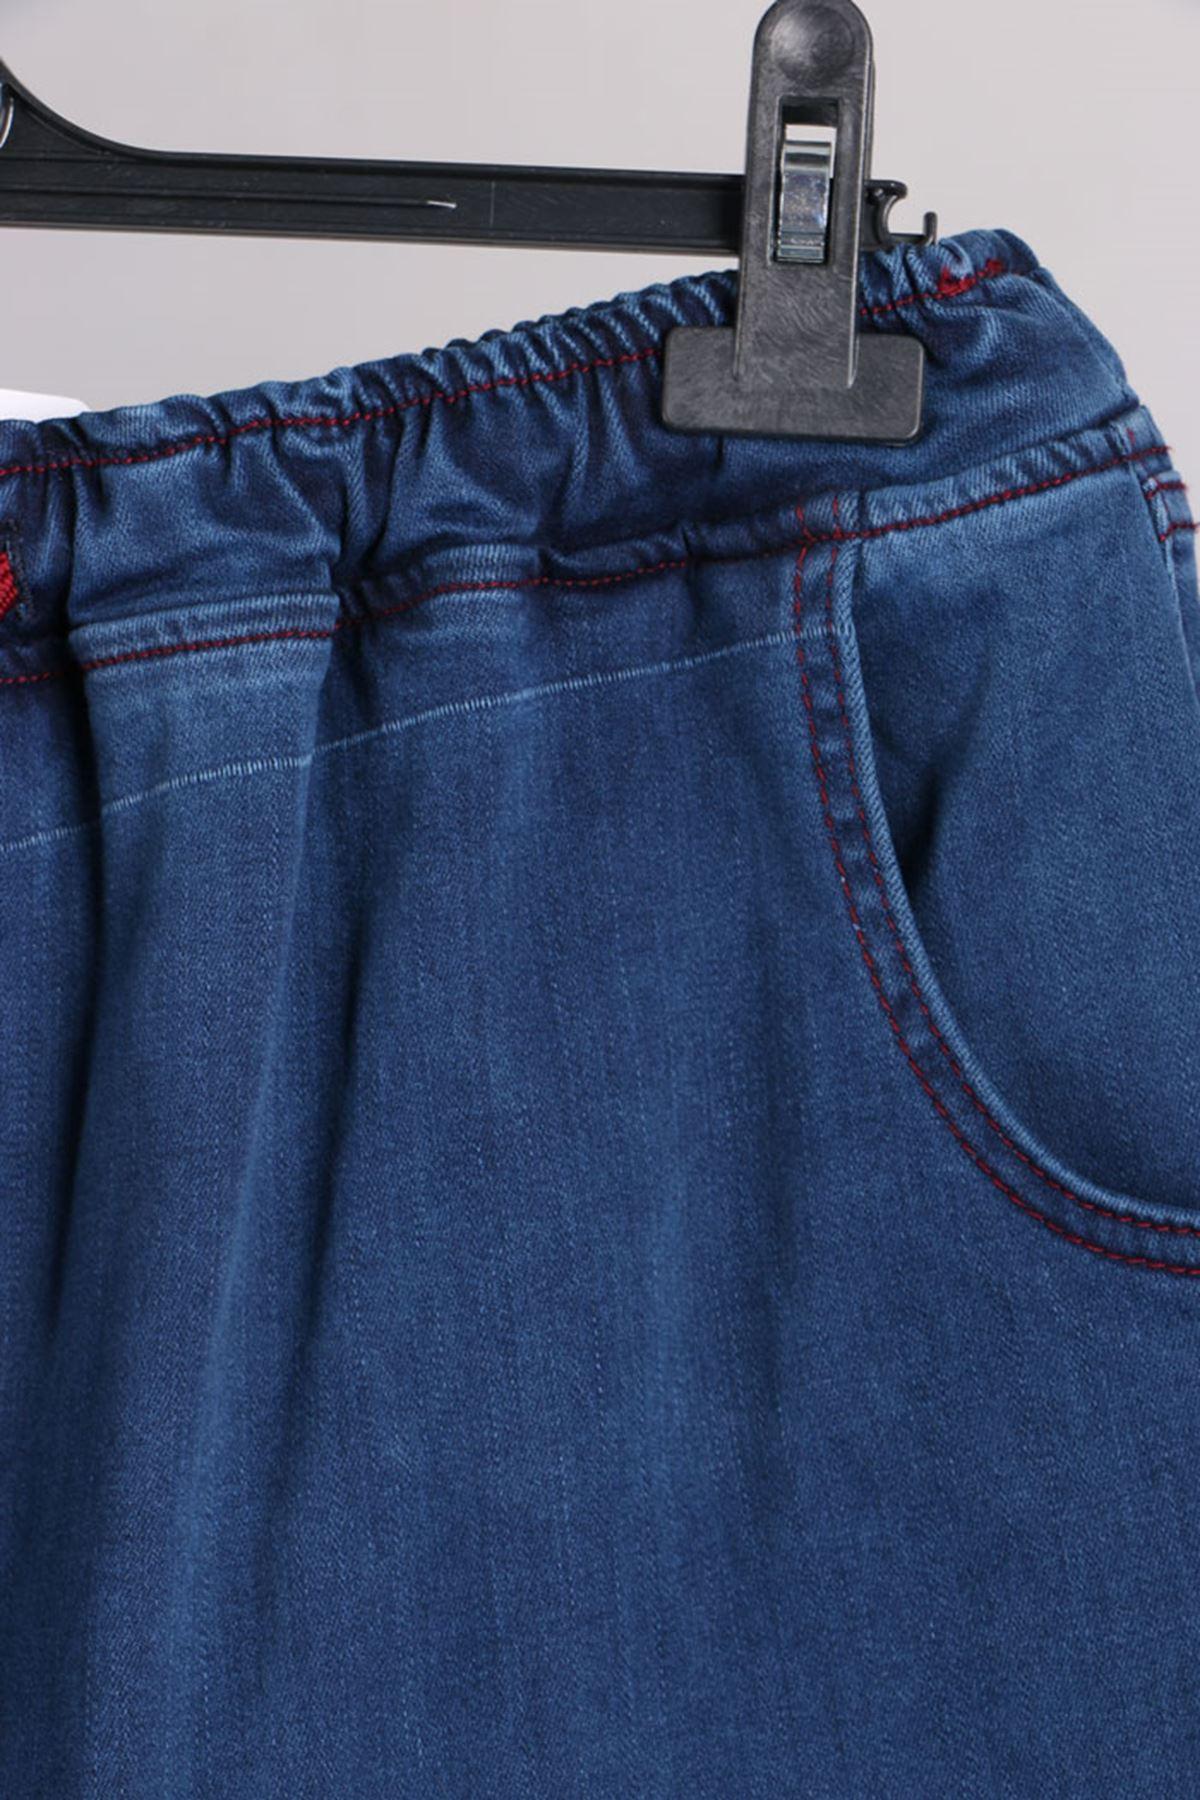 D-9136 Büyük Beden Defolu Beli Lastikli Mom Jeans Pantolon Koyu Mavi - Bordo